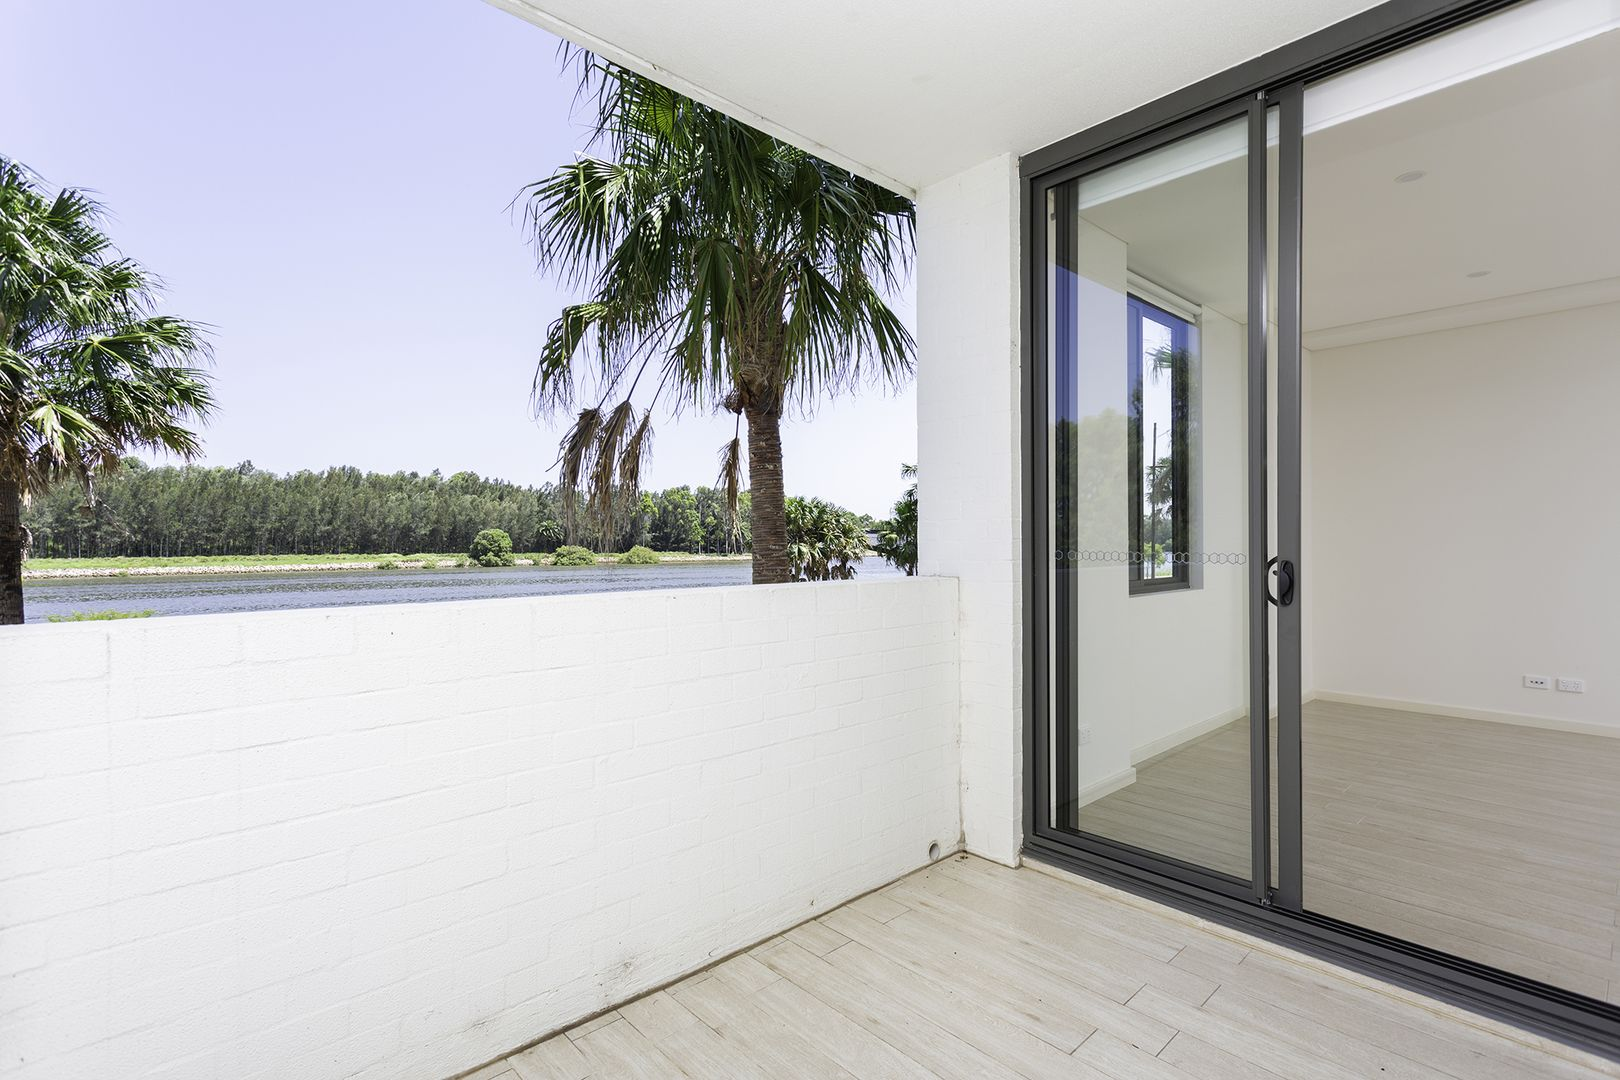 109/24-32 Koorine Street, Ermington NSW 2115, Image 1